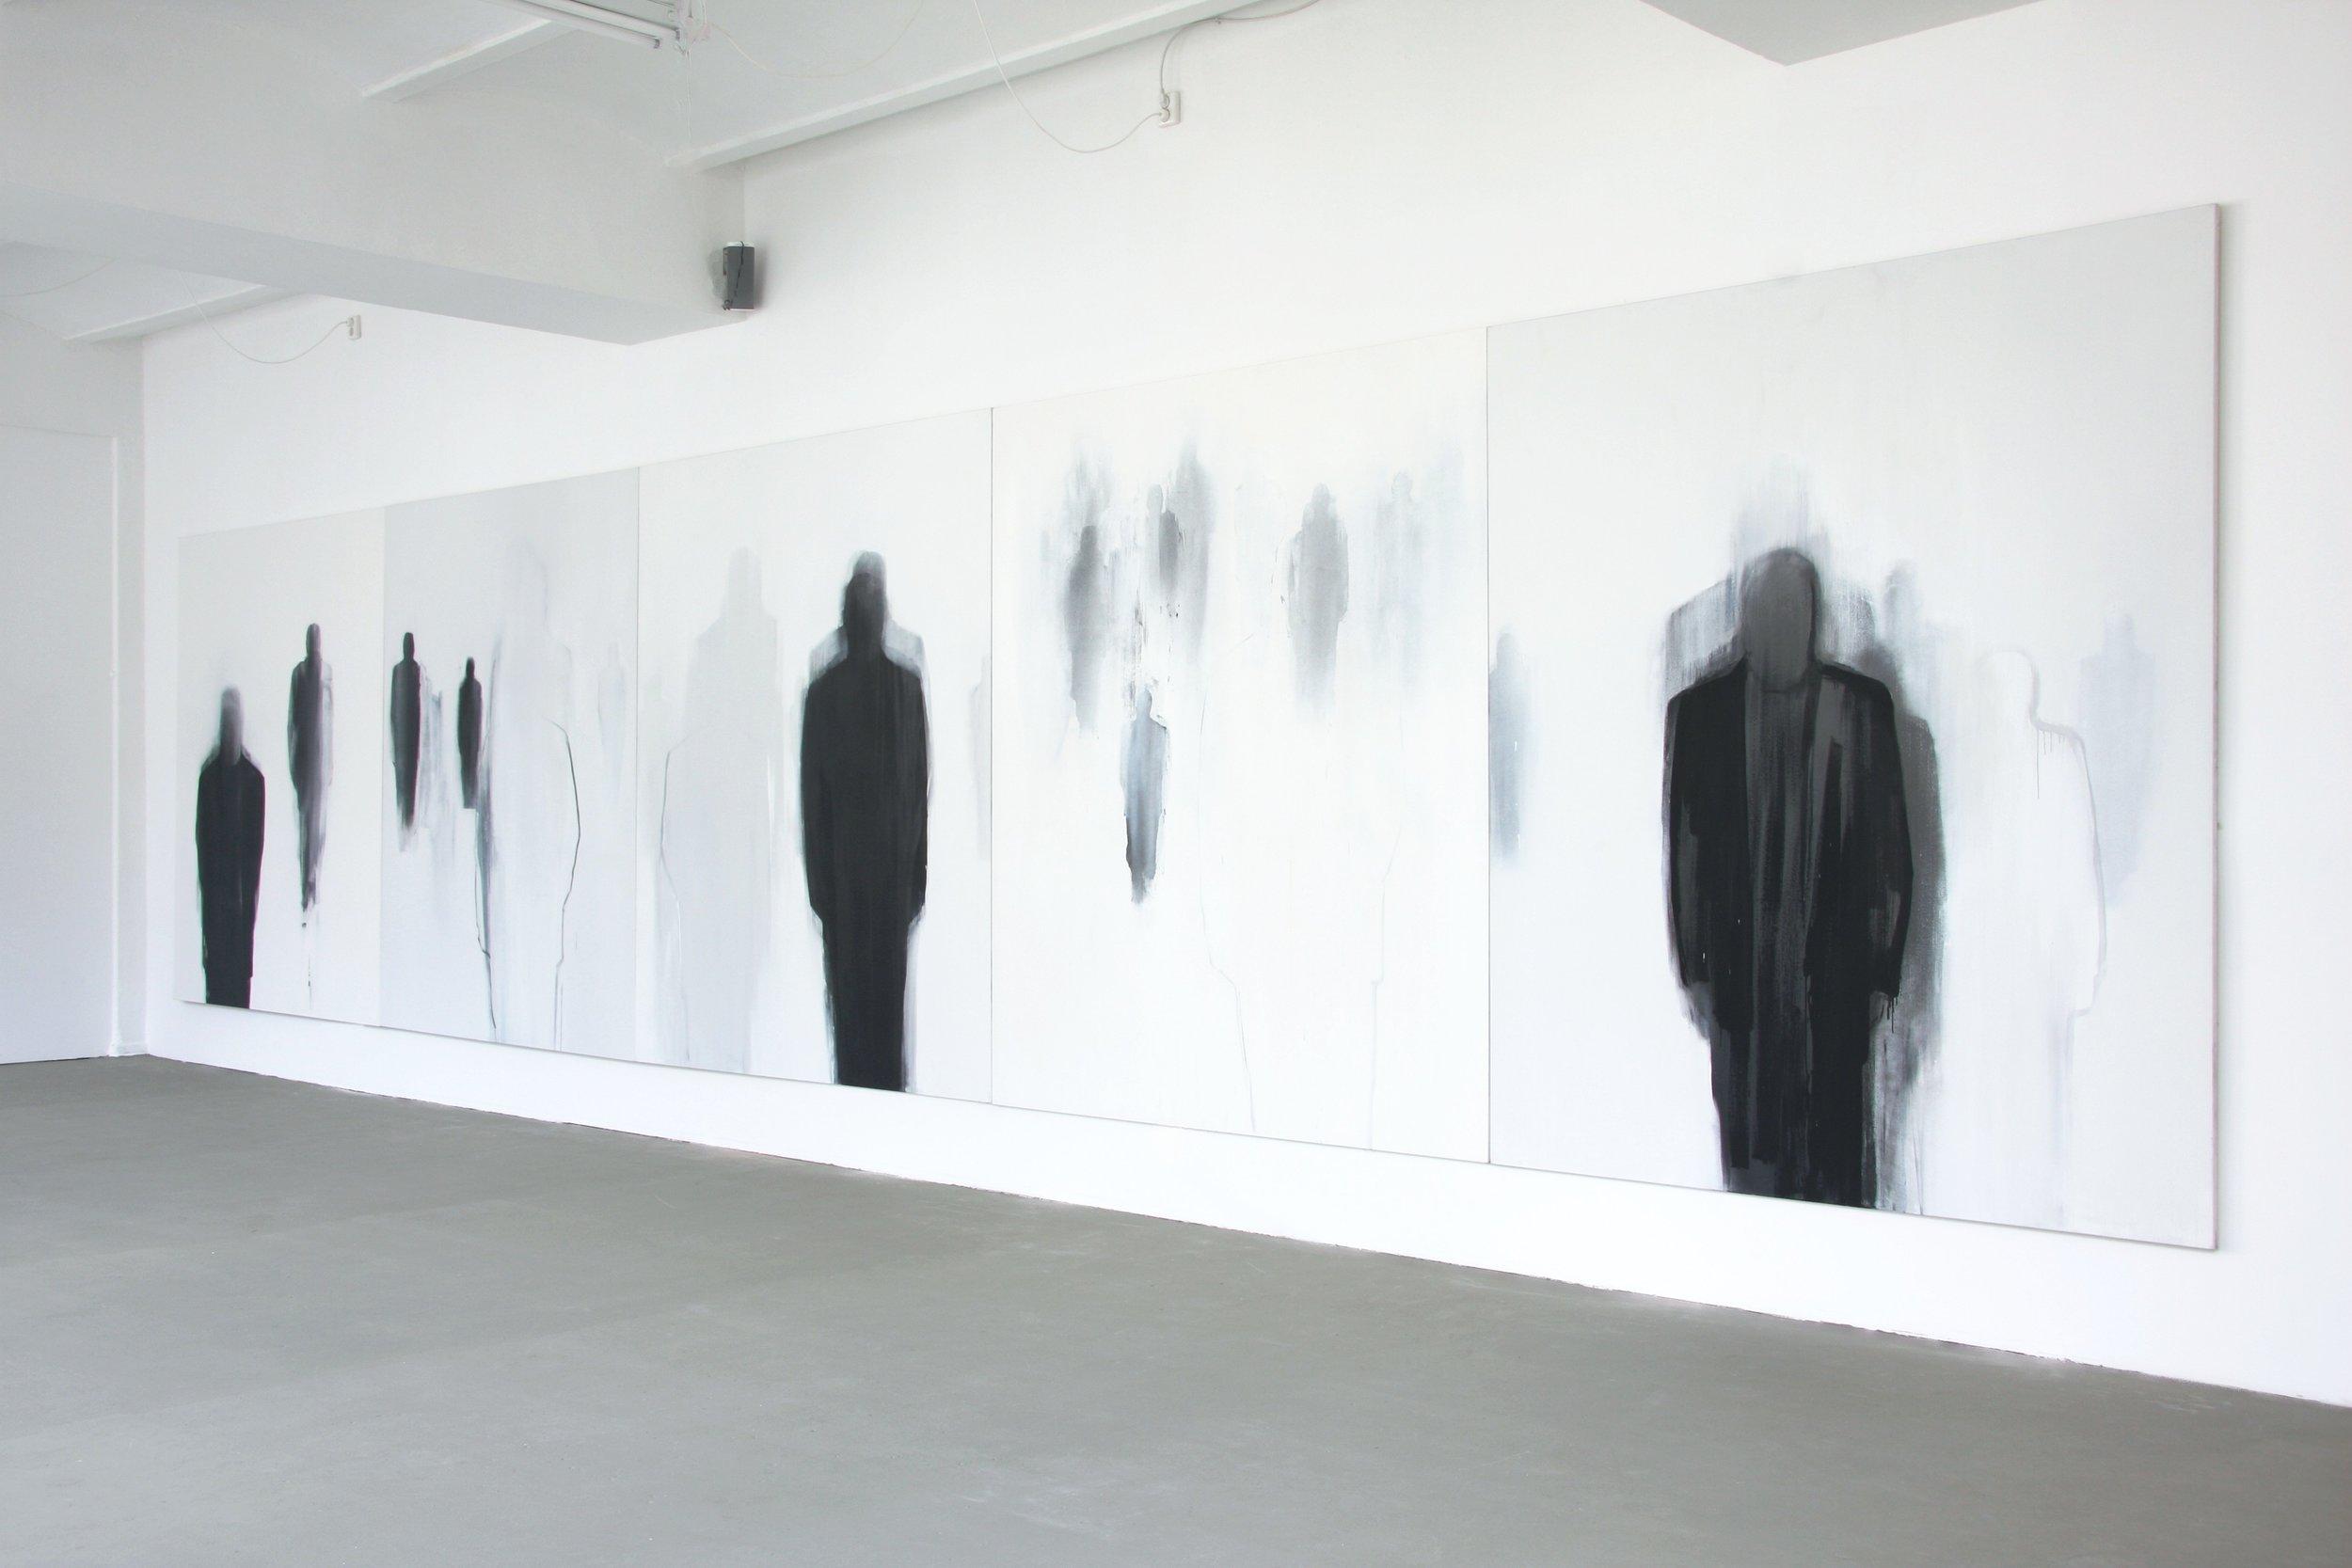 2012 Galerie Rolando Anselmi, Berlin